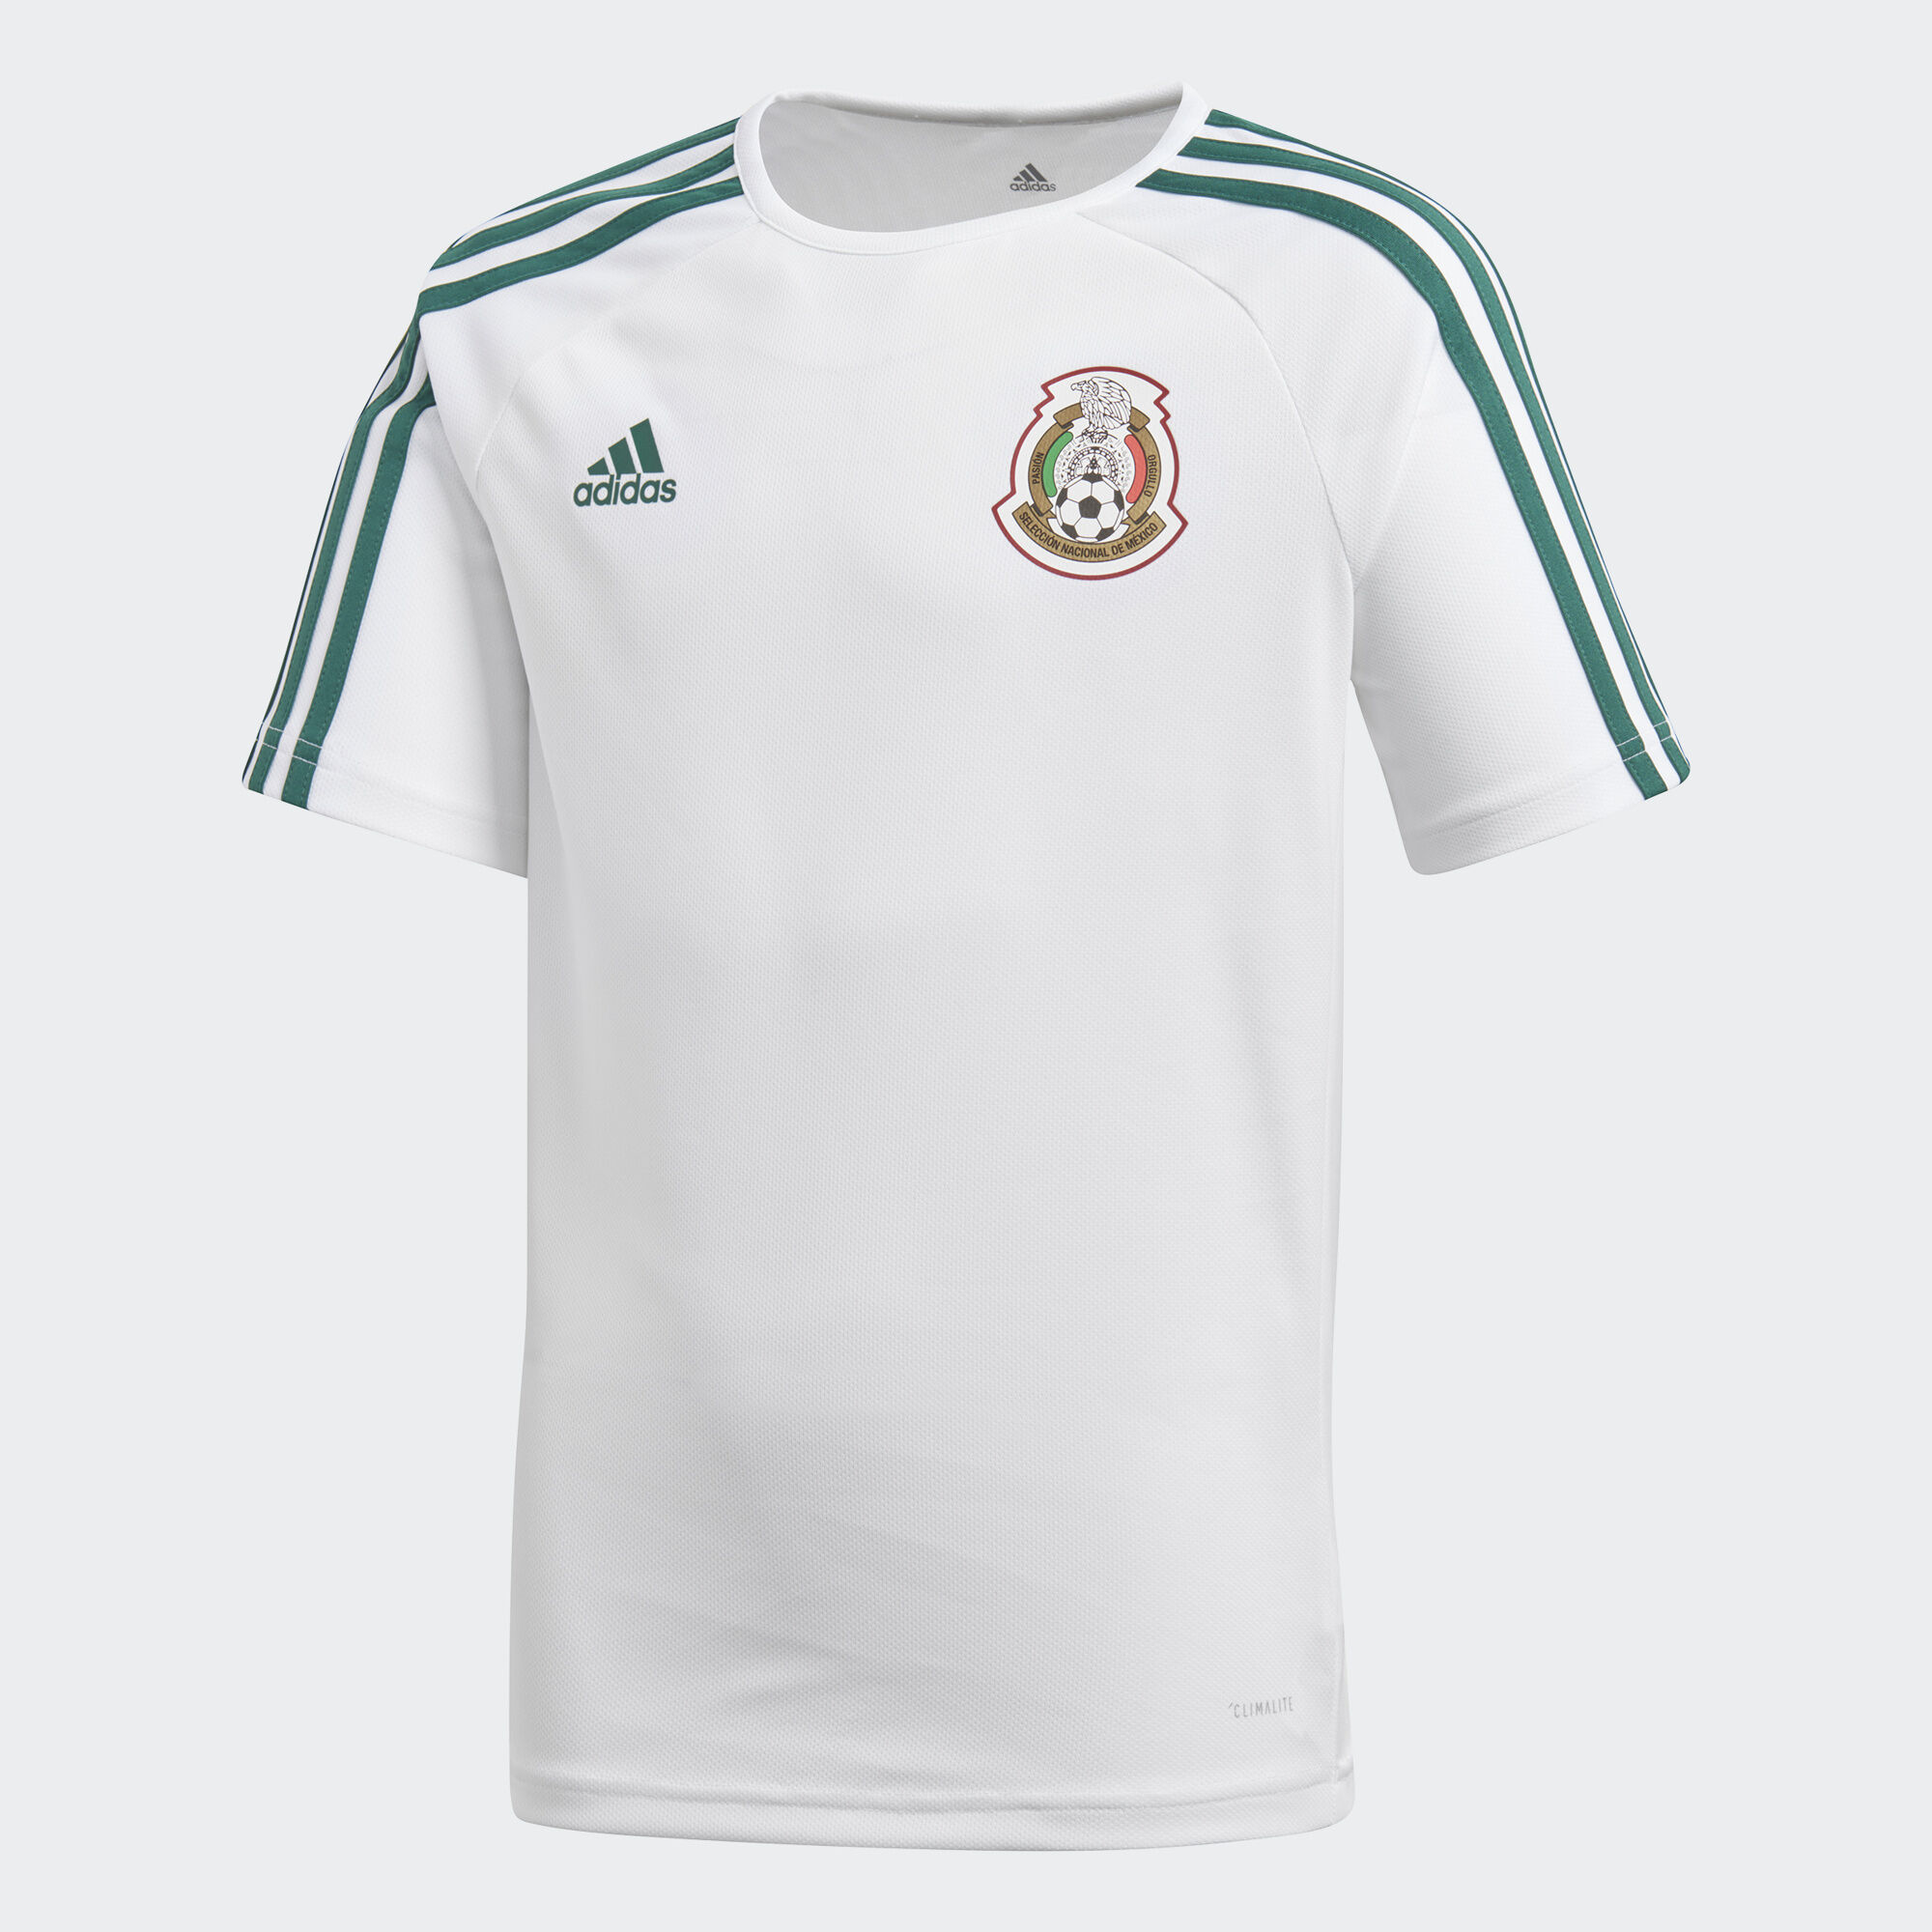 623bb1eed1607 adidas Playera México de Visitante Fan 2018 - Blanco